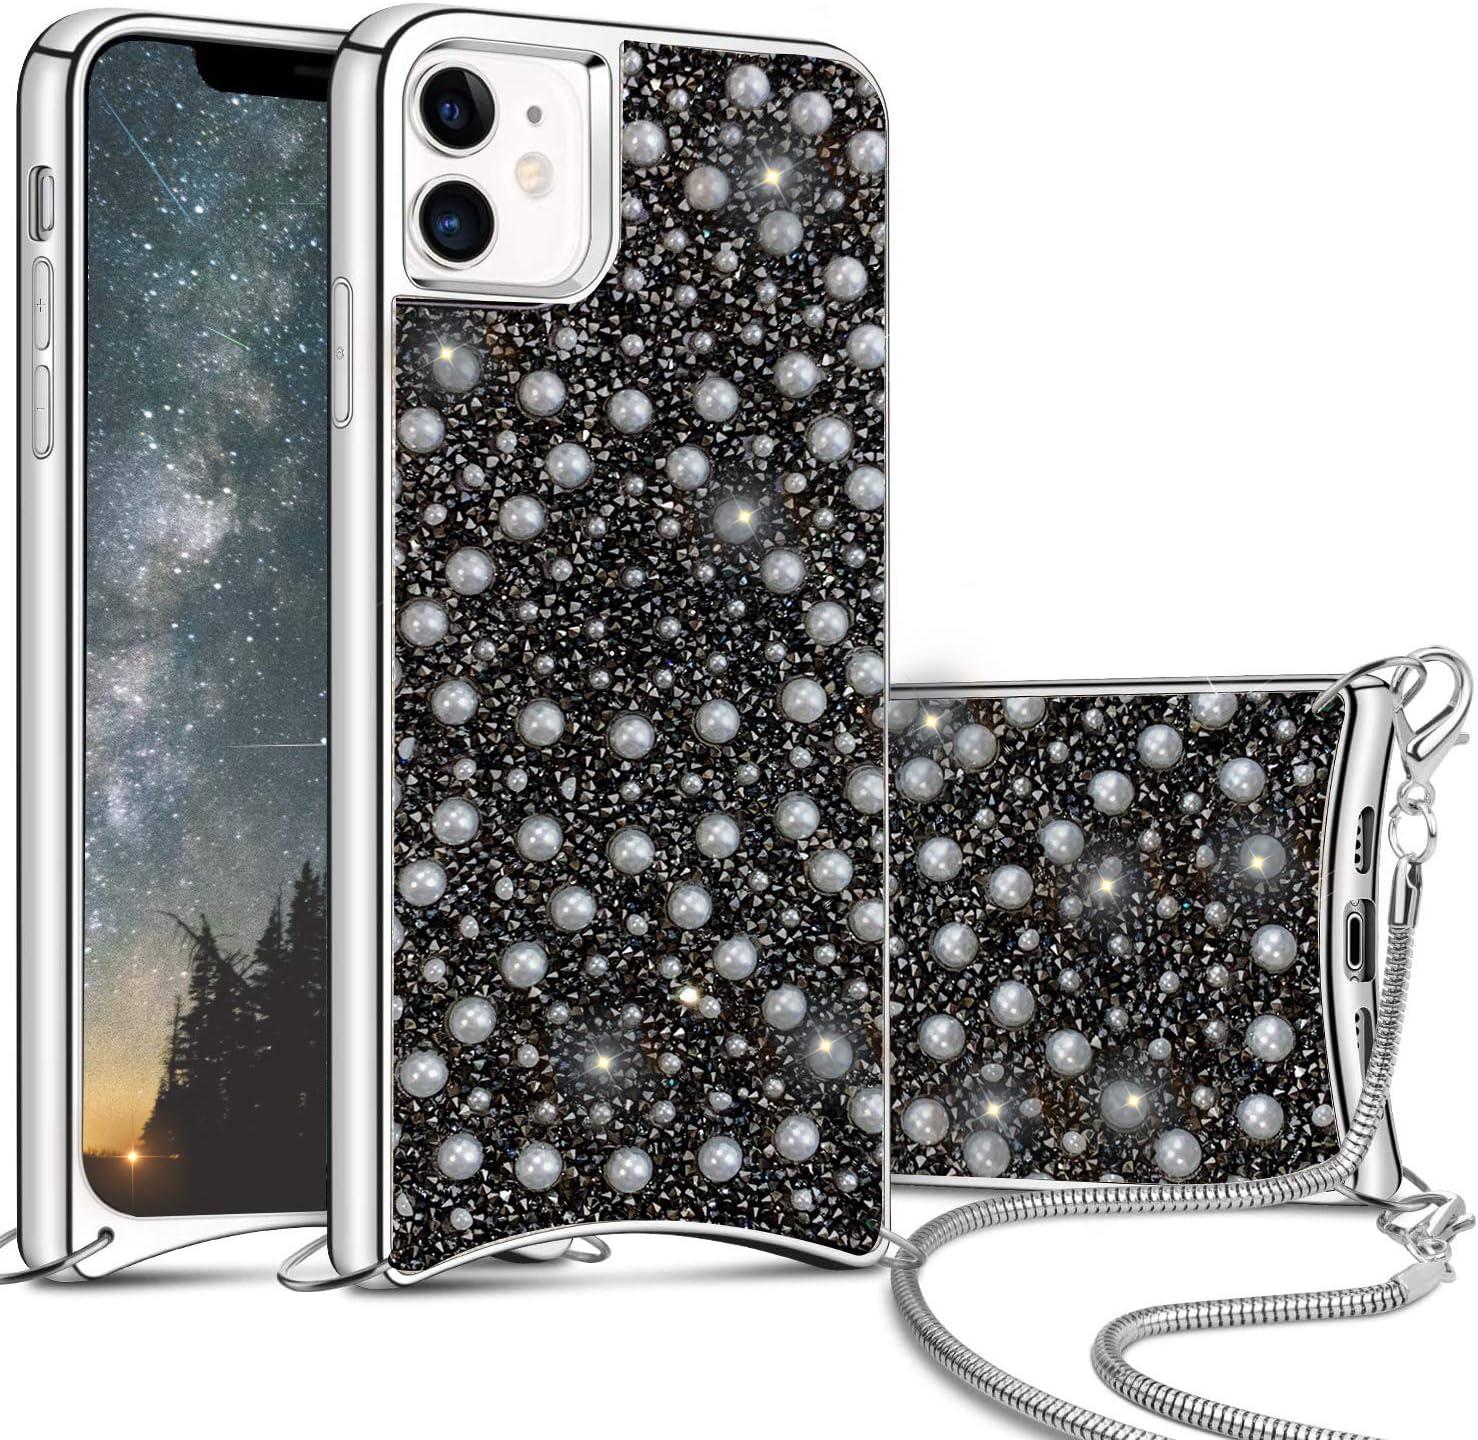 Valentoria iPhone 11 Case,Sparkle Glitter Case with Pearl Rhinestone,Bling Diamond Bumper Crossboday Chain Case Slim Protective Apple iPhone 11 6.1